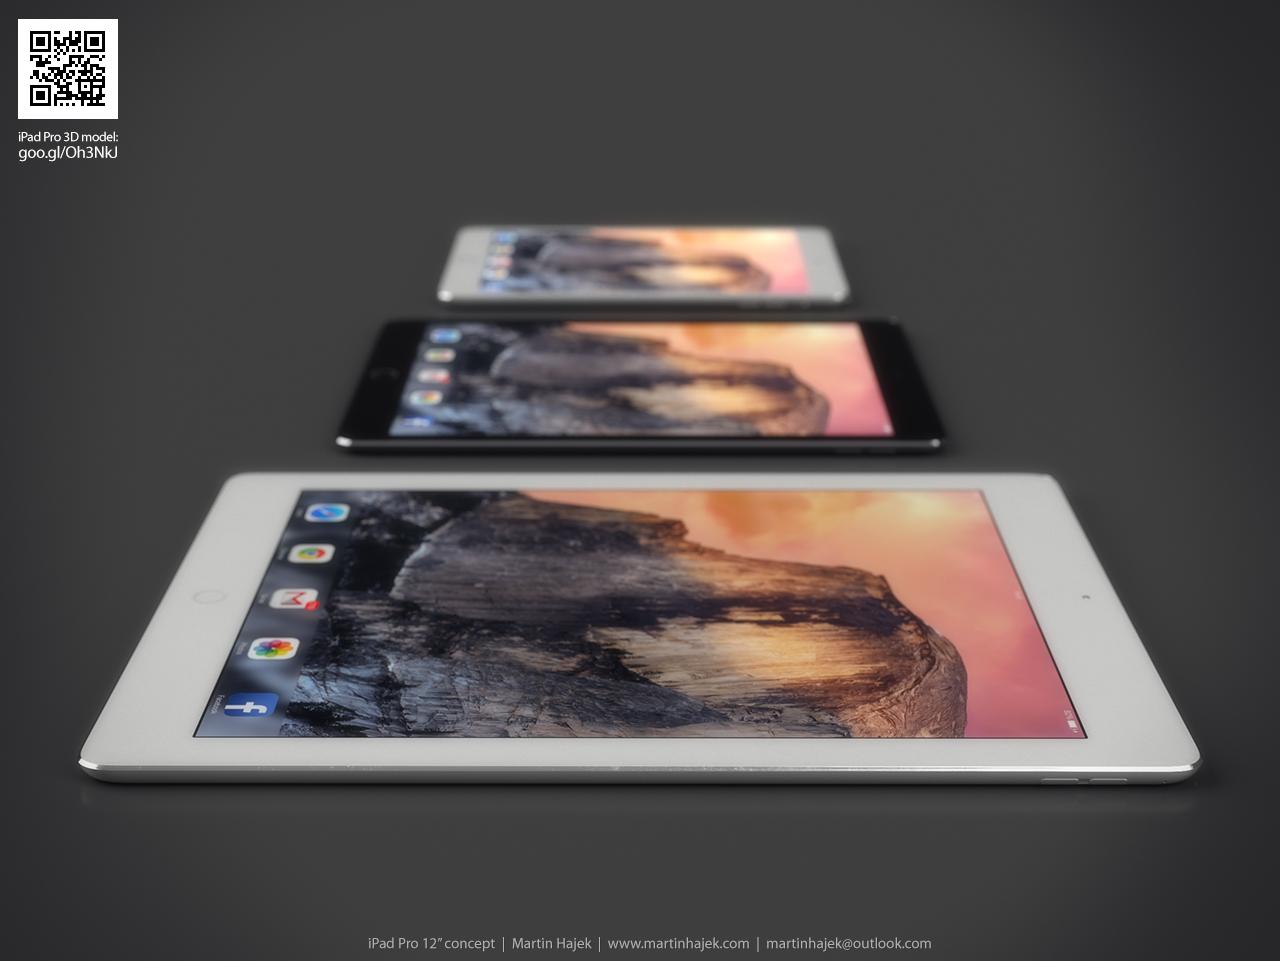 Apple-iPad-Air-Pro-3D-renders